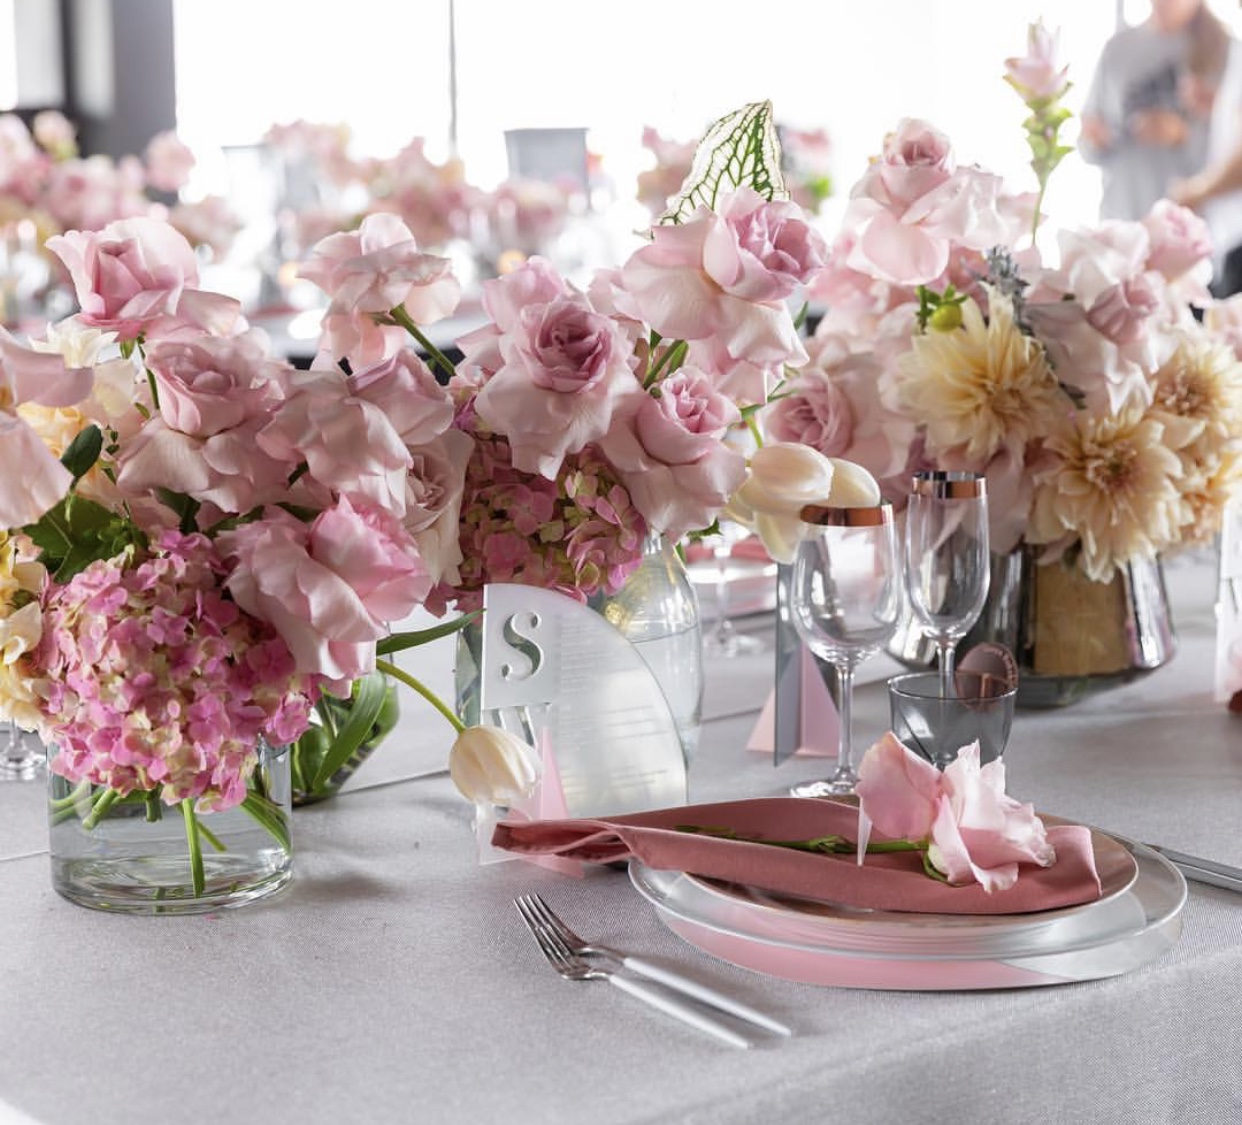 Hire_luxury_linen_sydney_wedding_silver_western_pink_florals_silver_cutlery.jpg